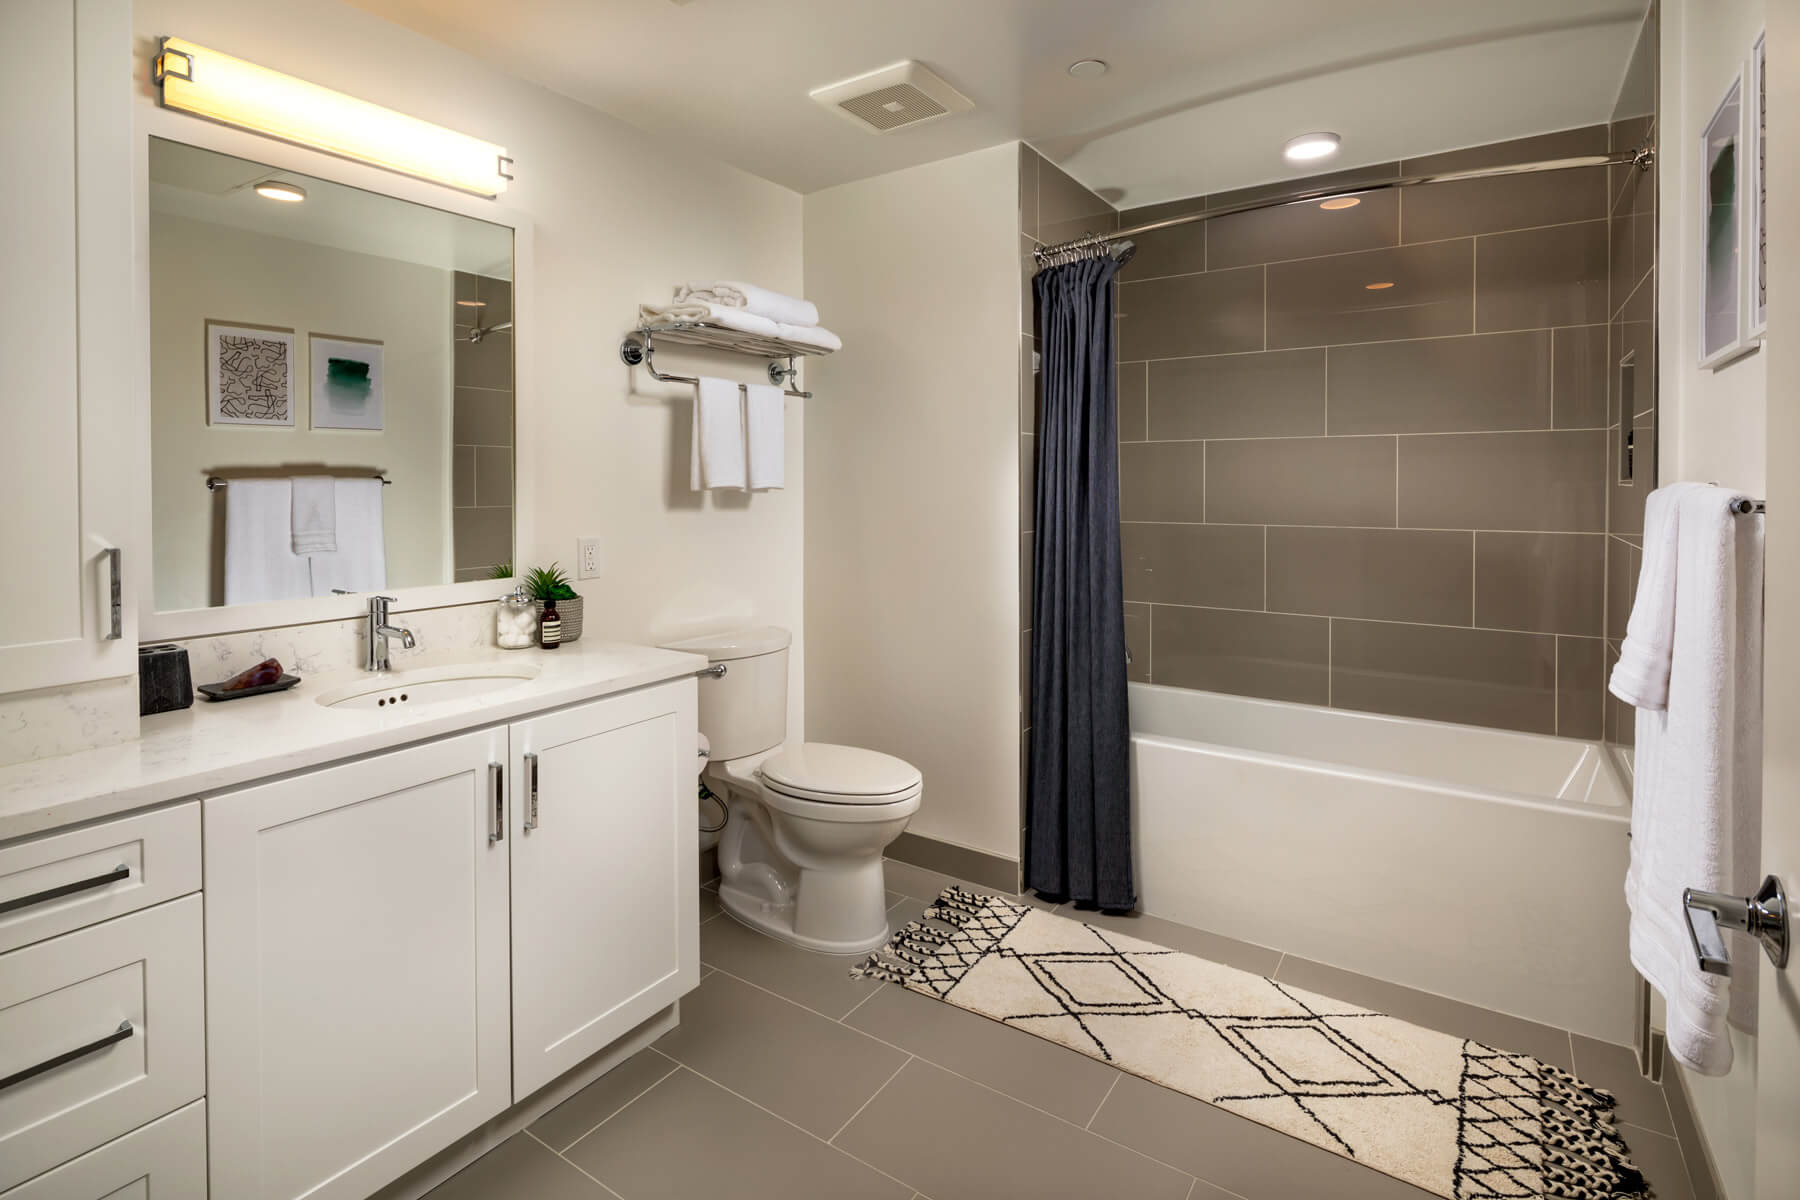 One Bedroom Residence Master Bathroom